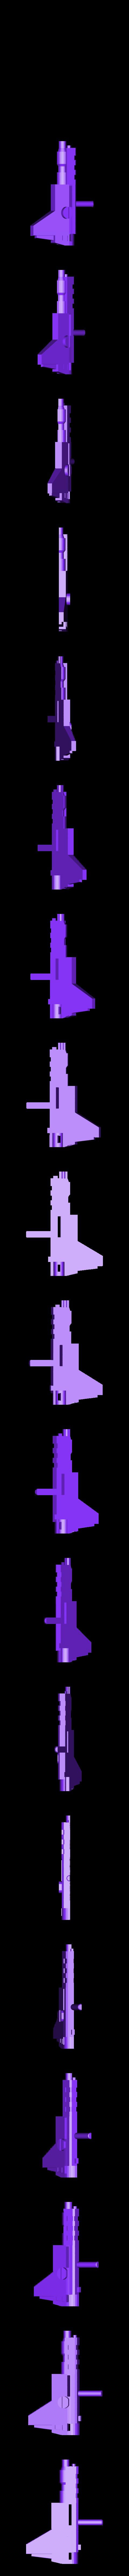 Gun4roundhandle.stl Download STL file KO TFC Uranos Upgrade Kit IDW Ver • 3D printer object, Toymakr3D